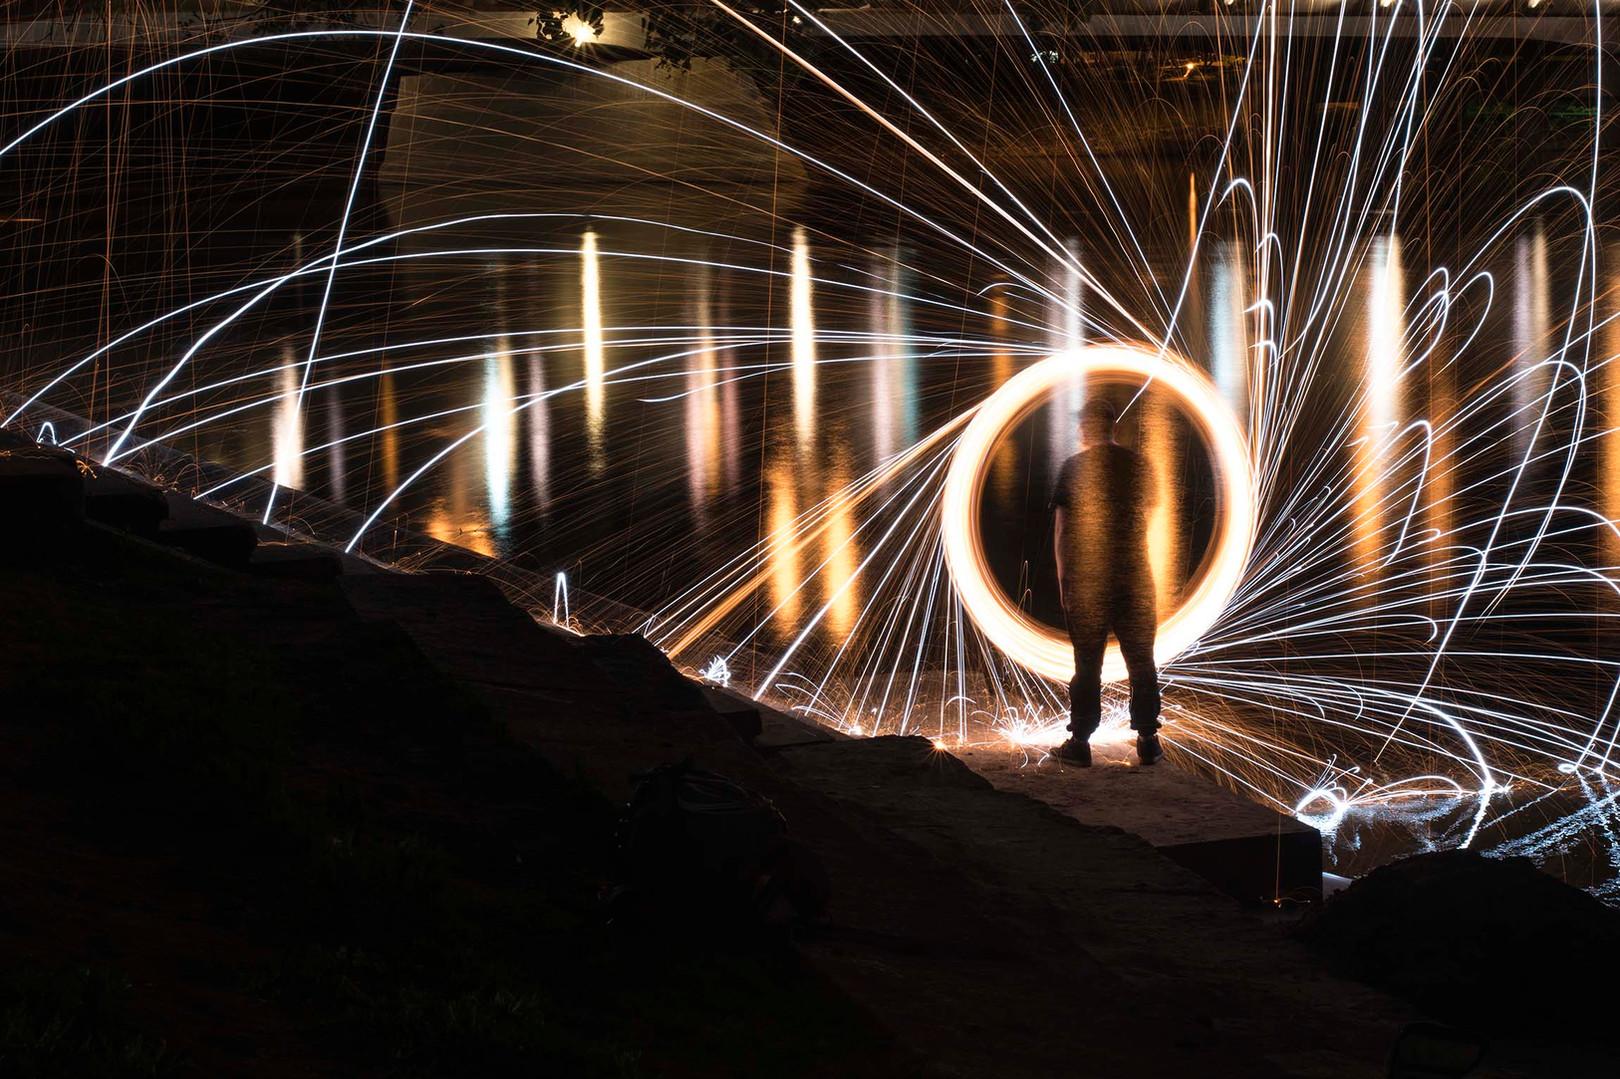 Steel Wool Photography in Winnipeg, Canada